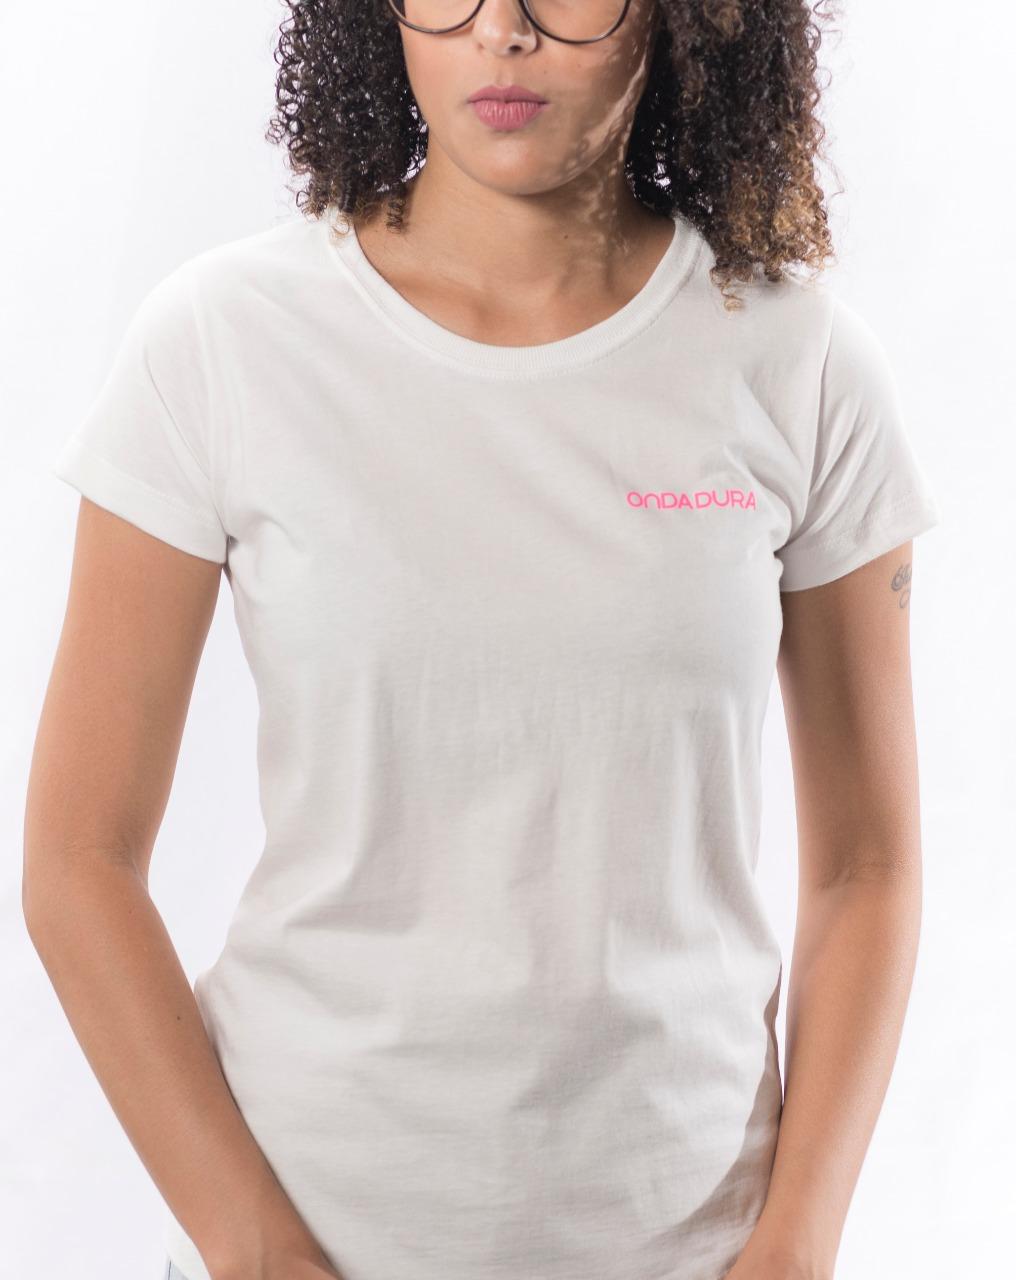 Babylook branca com logo Onda Dura rosa neon no peito